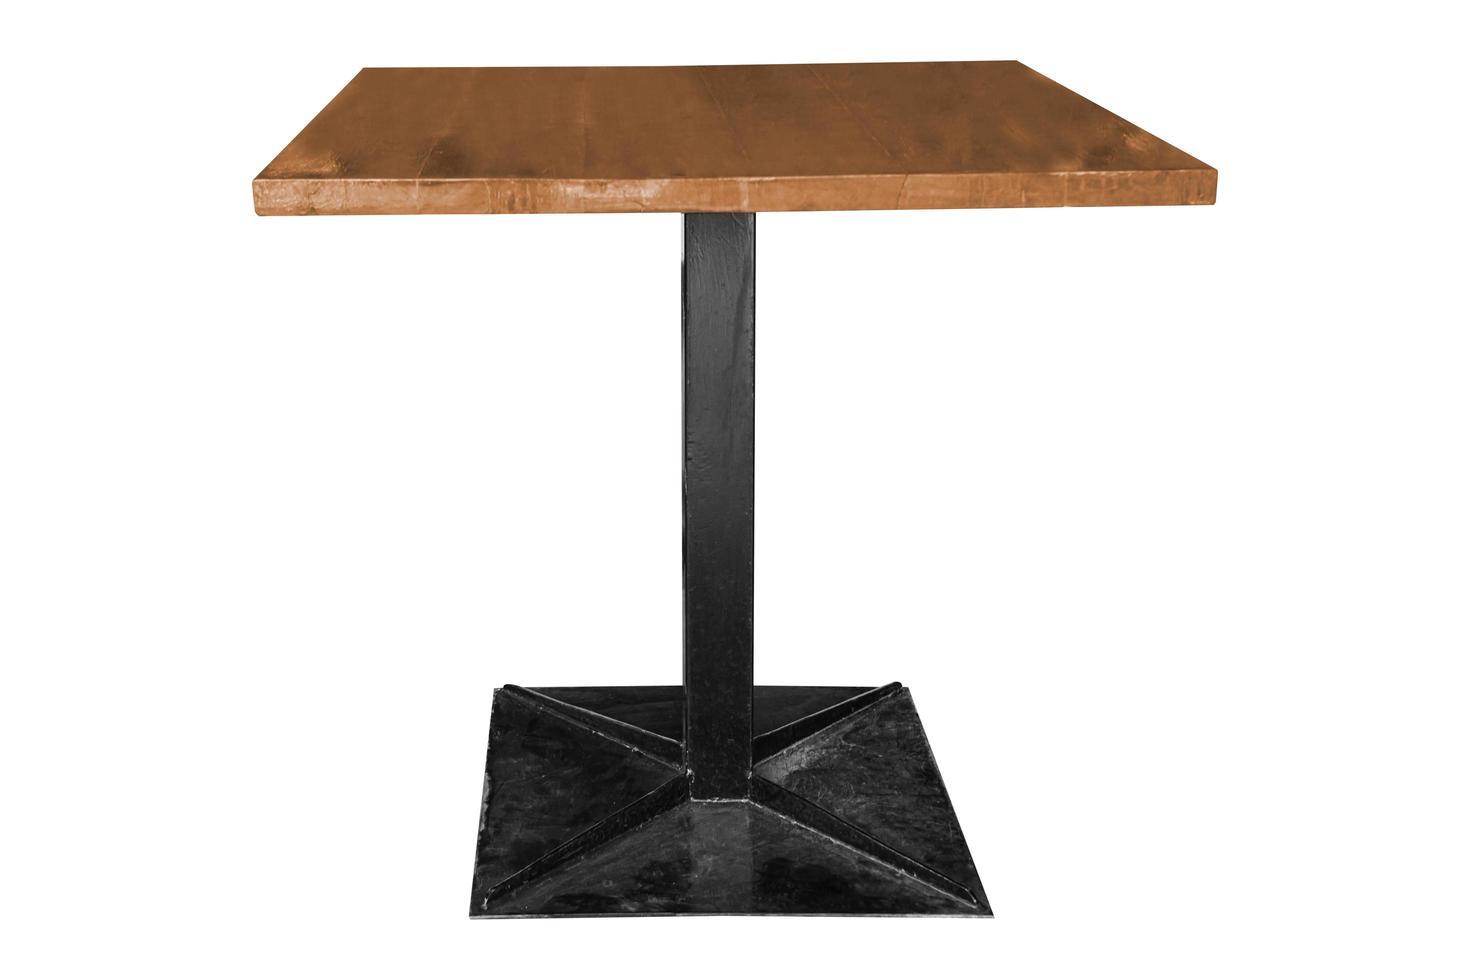 Mesa de madera moderna con patas de acero sobre fondos blancos foto